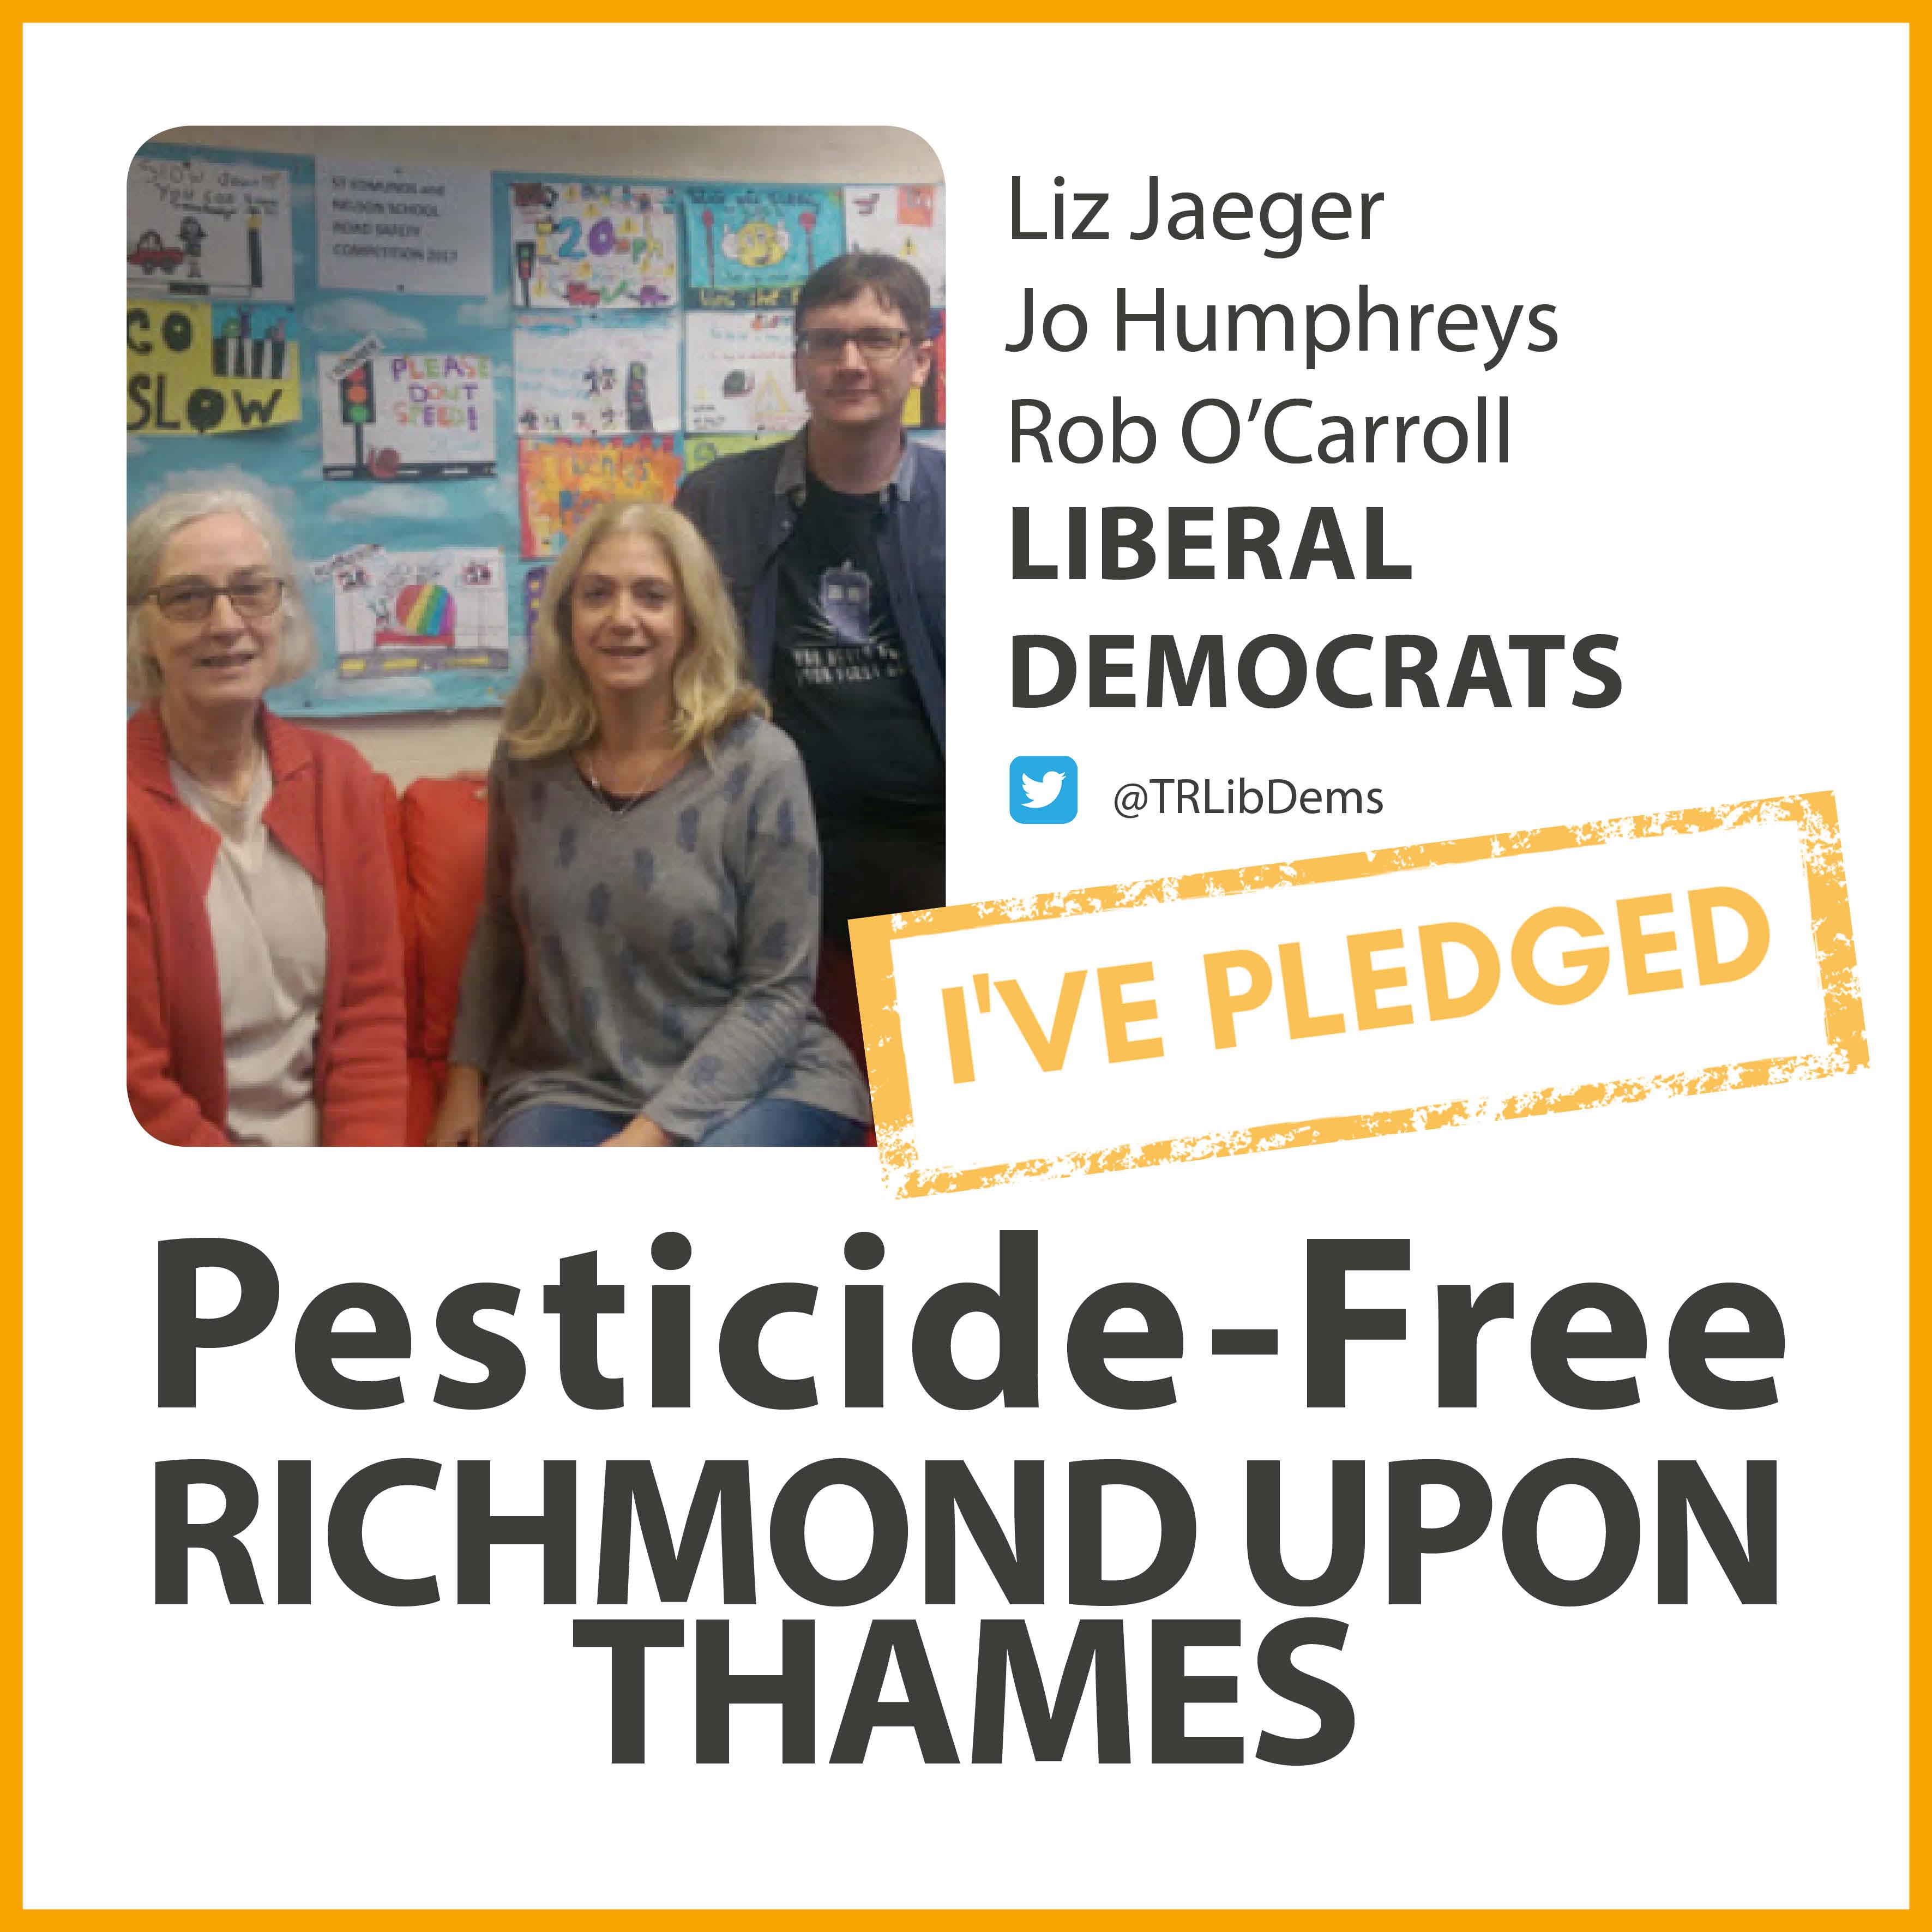 Whitton Lib Dems have taken the pesticide-free pledge